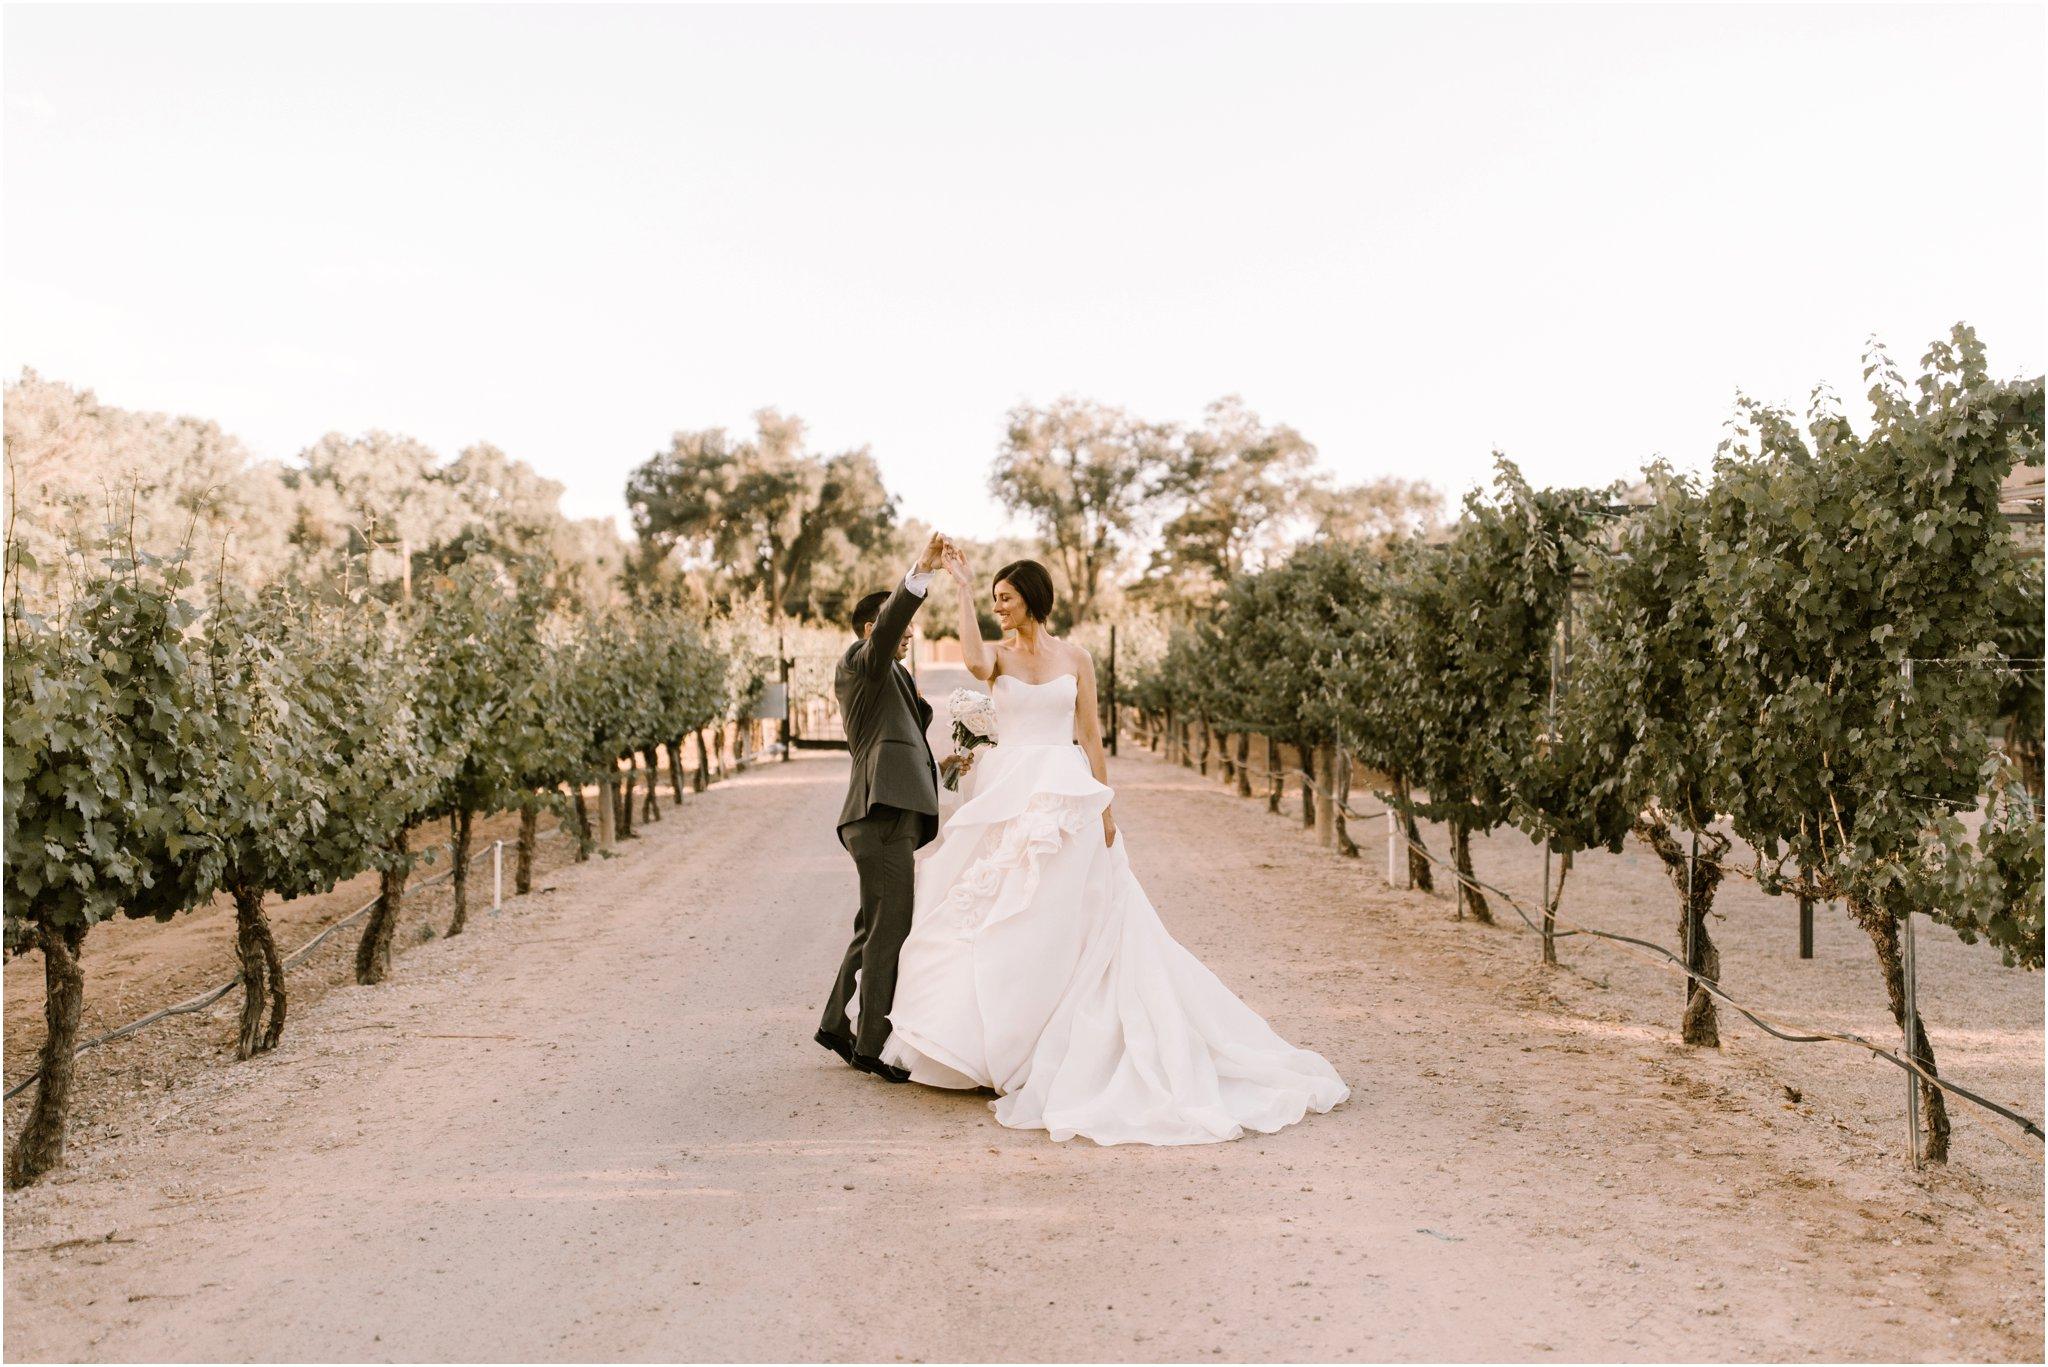 0215Casa Rodena Winery Wedding, Inn and Spa at Loretto wedding, Santa Fe wedding photographers, blue rose photography